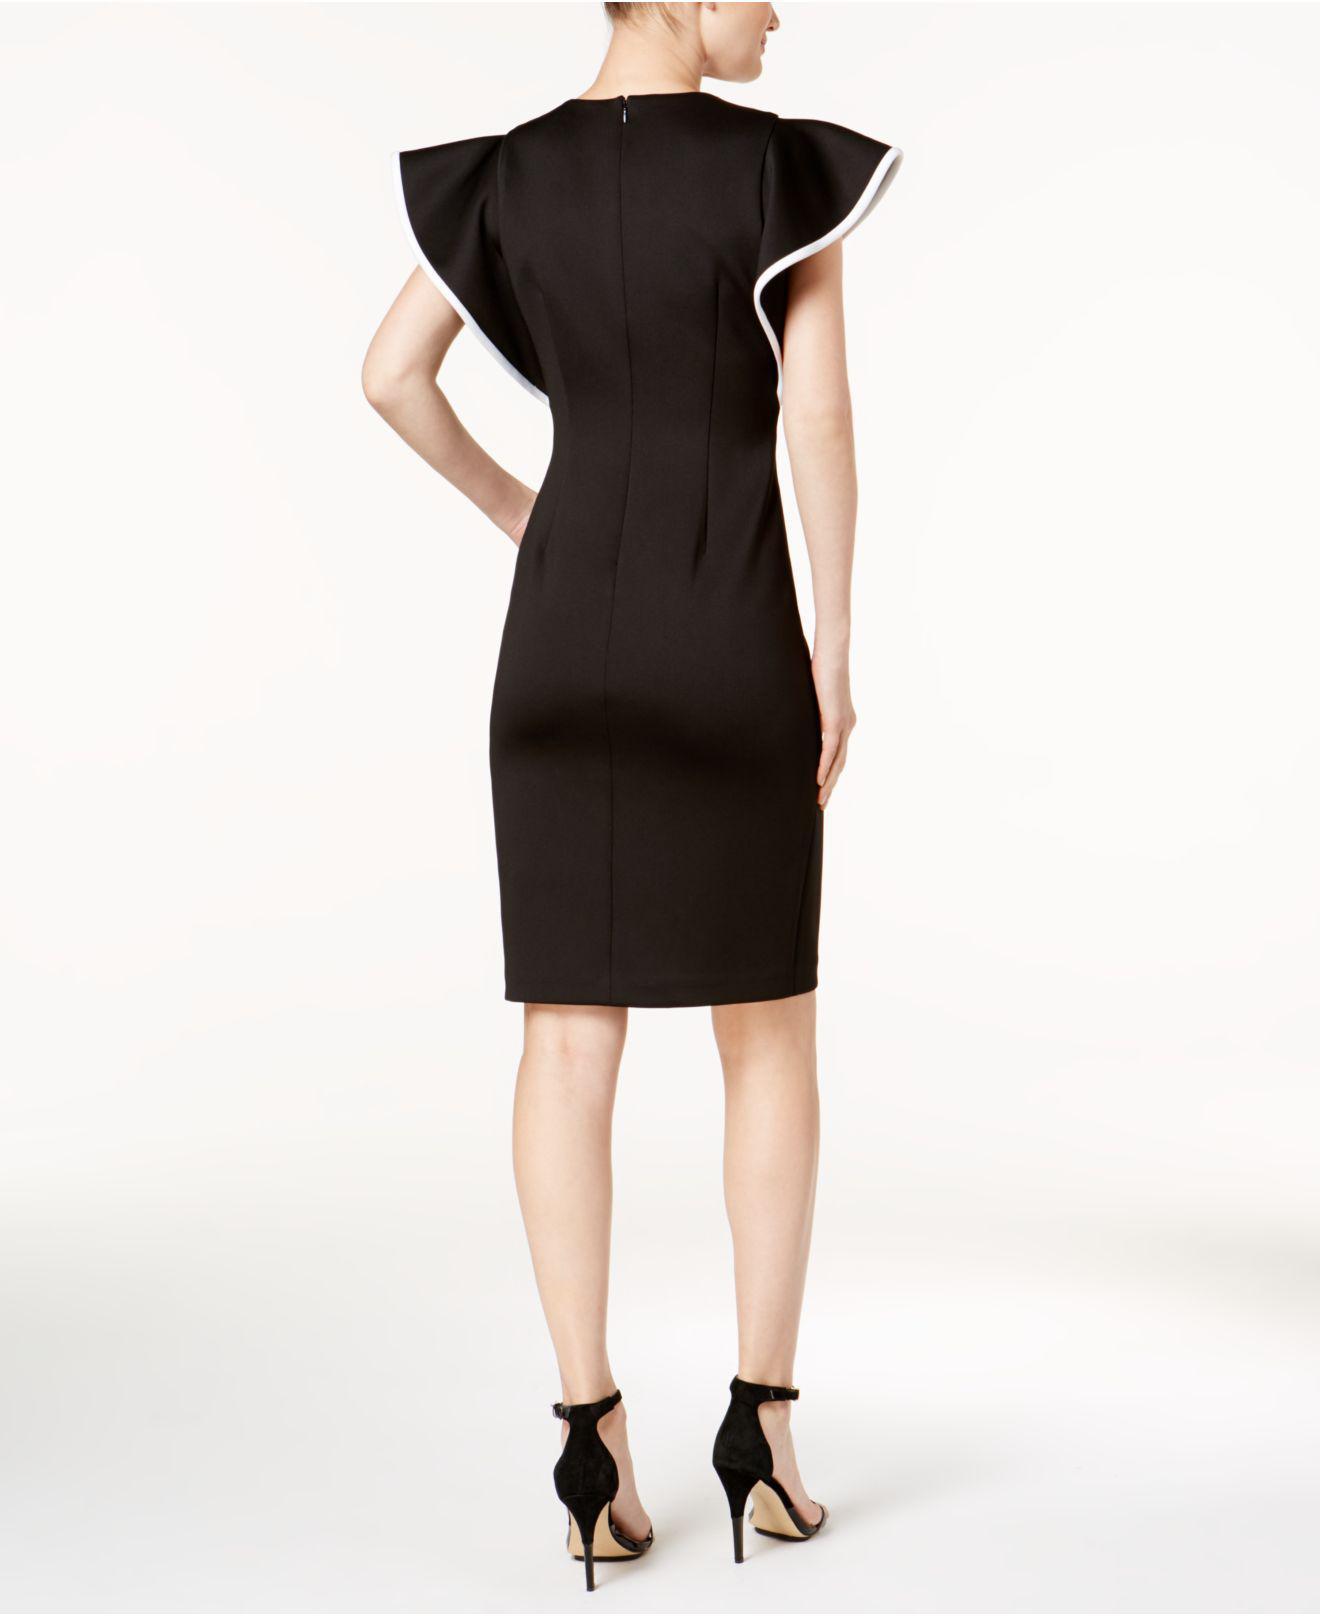 6f7bc209 Calvin Klein Piped-ruffle Sheath Dress in Black - Lyst